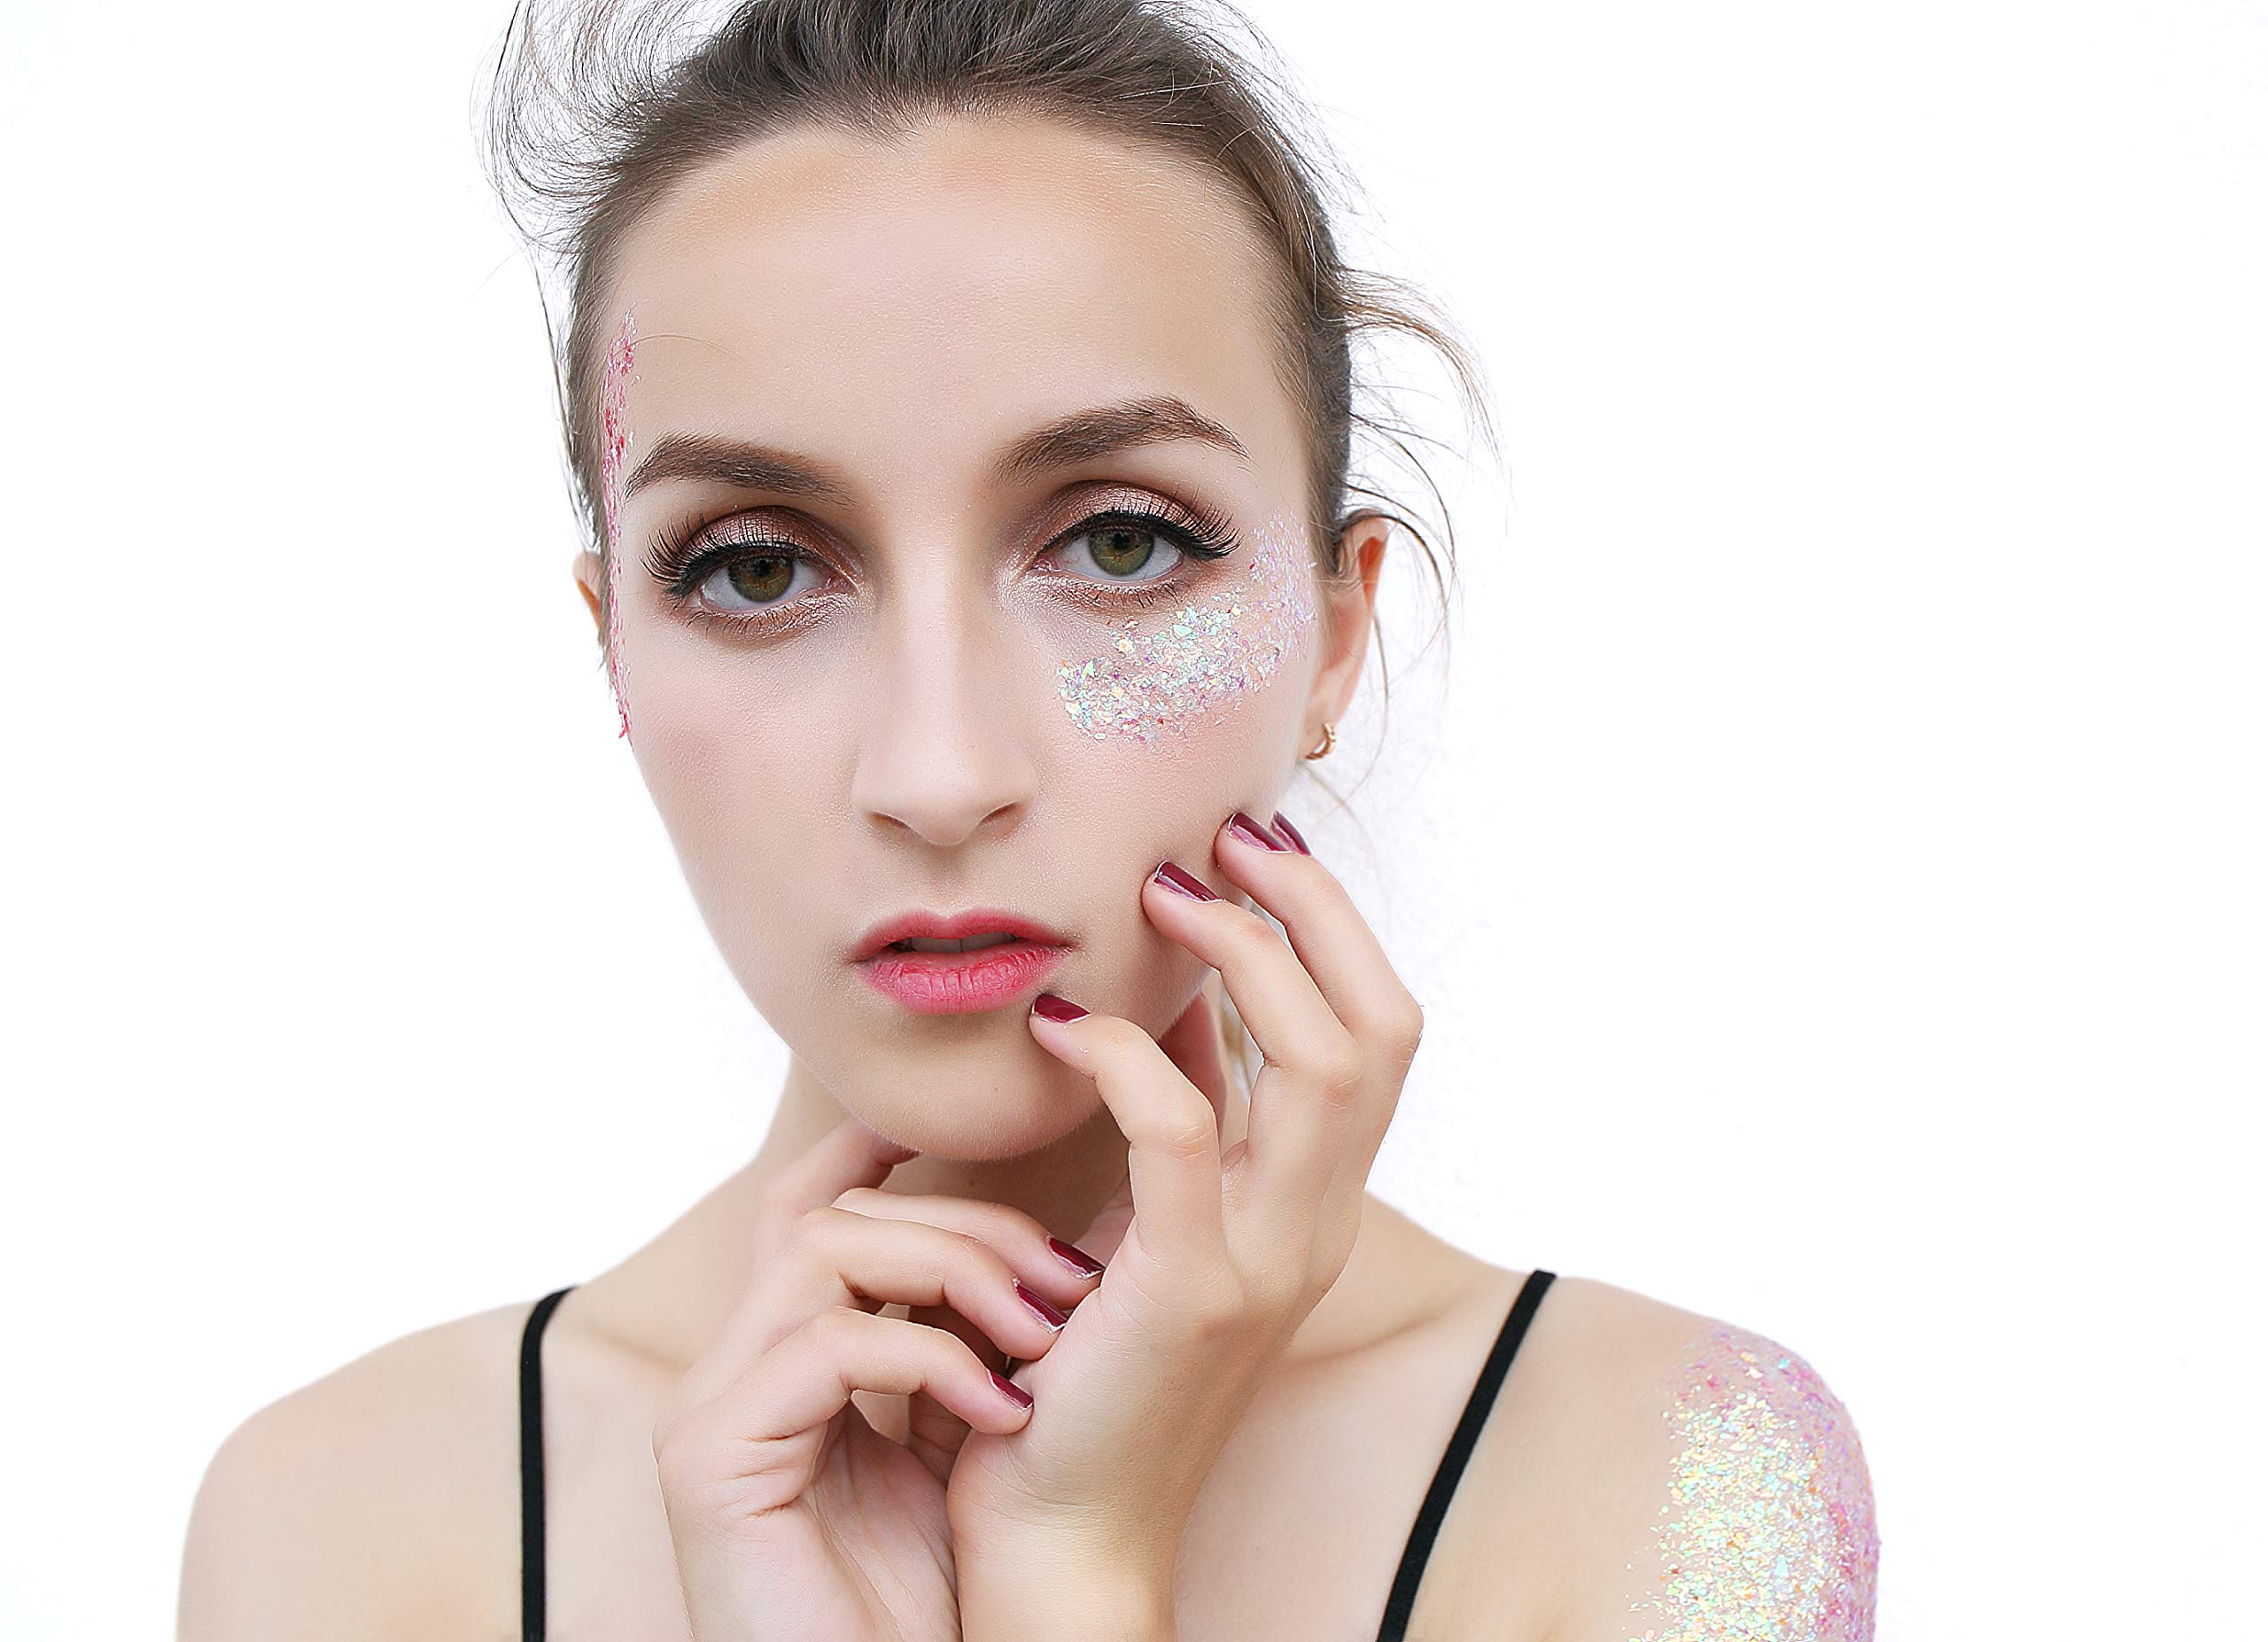 Larruping 6 Colors Irregular Shape Highlight Chunky Glitter Body Glitter Festival Glitter With Cruelty Free Glitter Gel Cosmetic Face Body Hair Nail